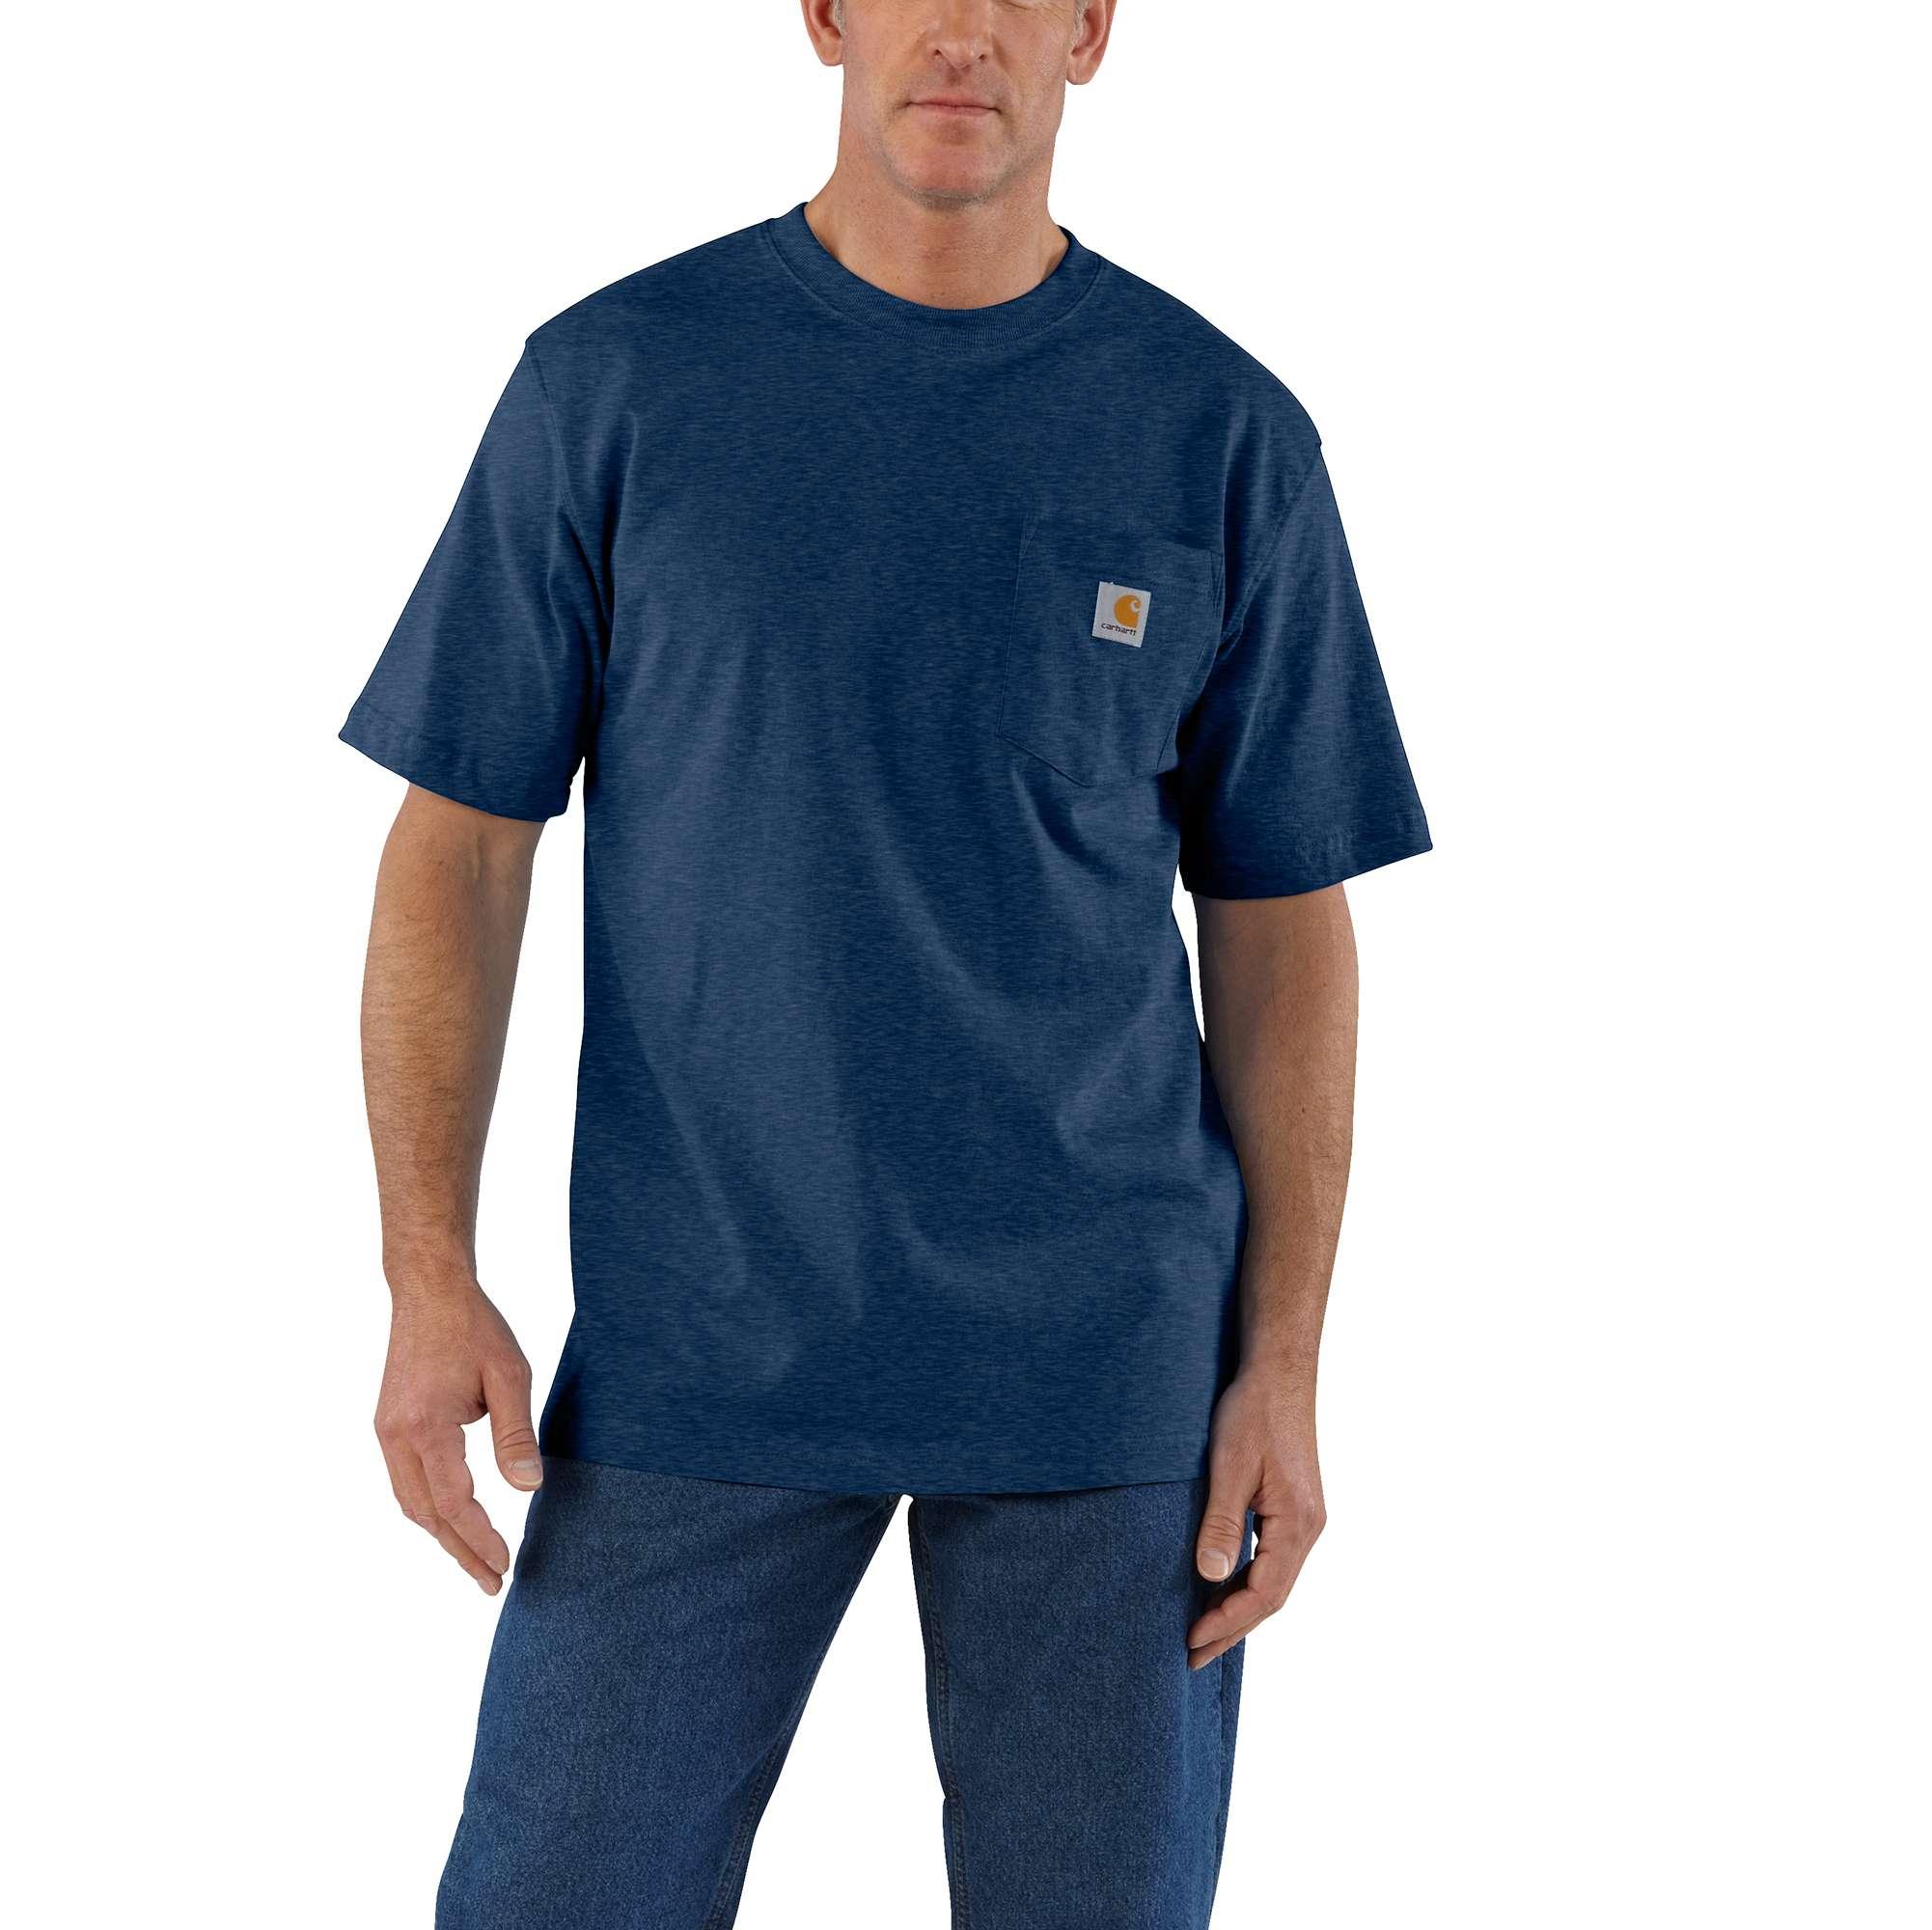 Men's Workwear Pocket T-Shirt, Heather Blue, swatch